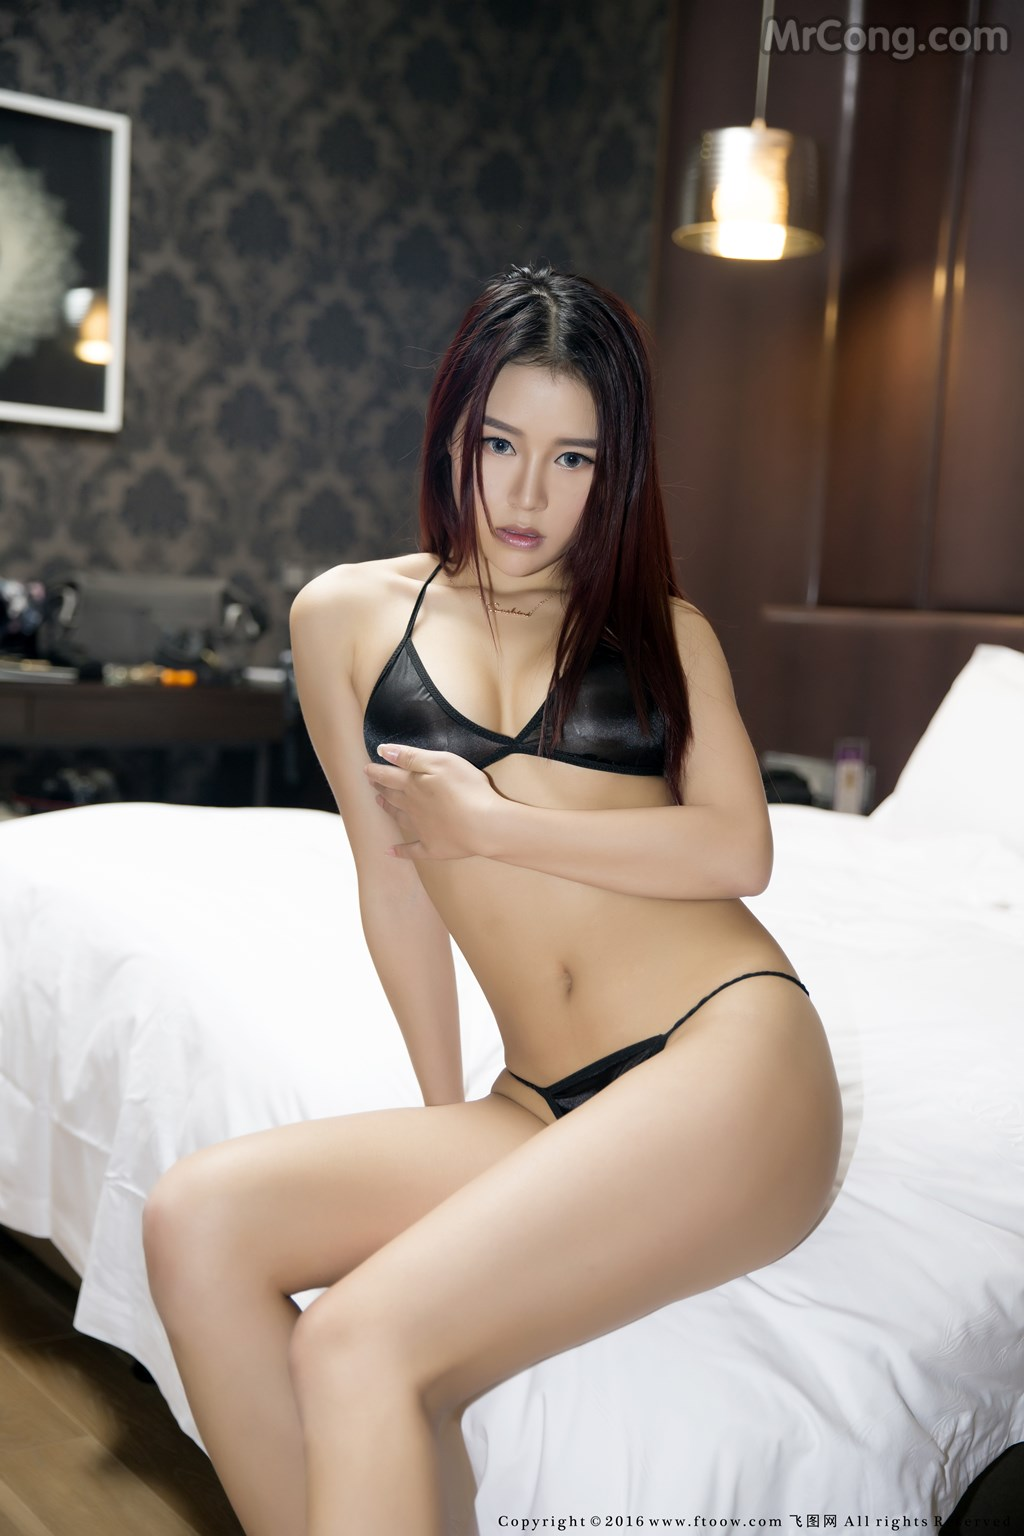 Image FToow-No.012-Tang-MrCong.com-022 in post FToow No.012: Người mẫu Tang倩 (50 ảnh)